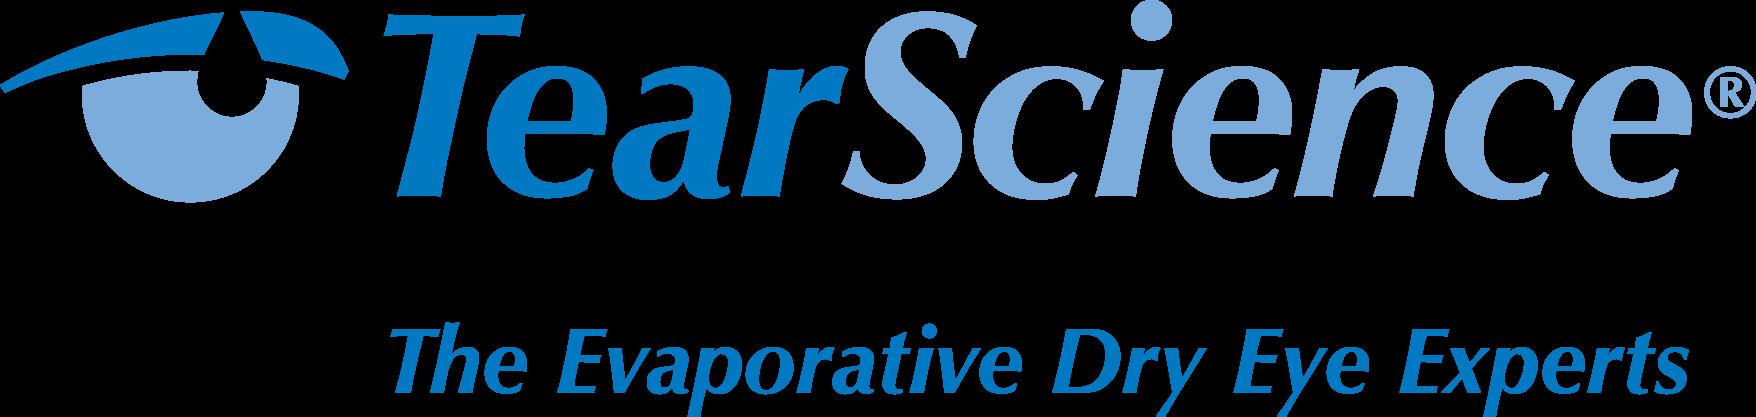 Tear Science Logo (1).png